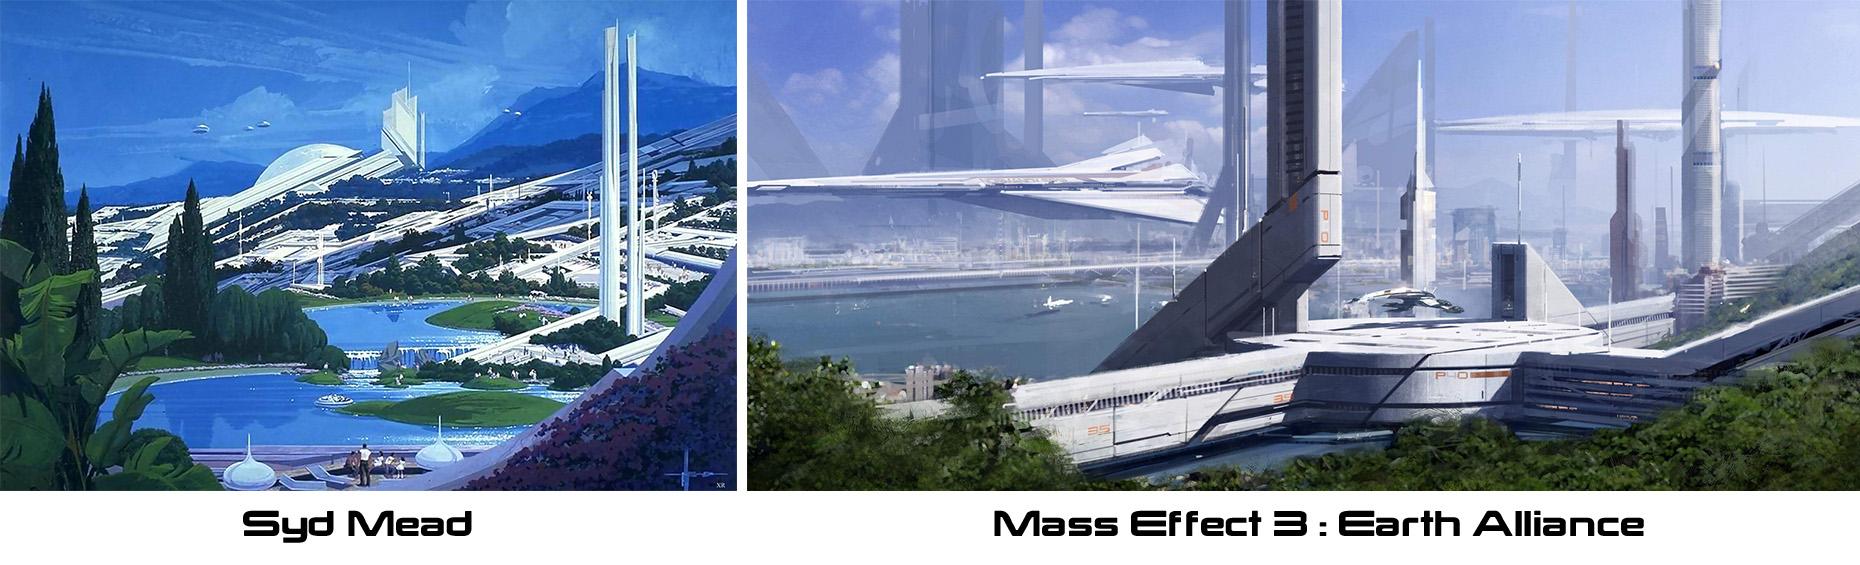 syd-mead-mass-effect-3-eath-alliance-artwork